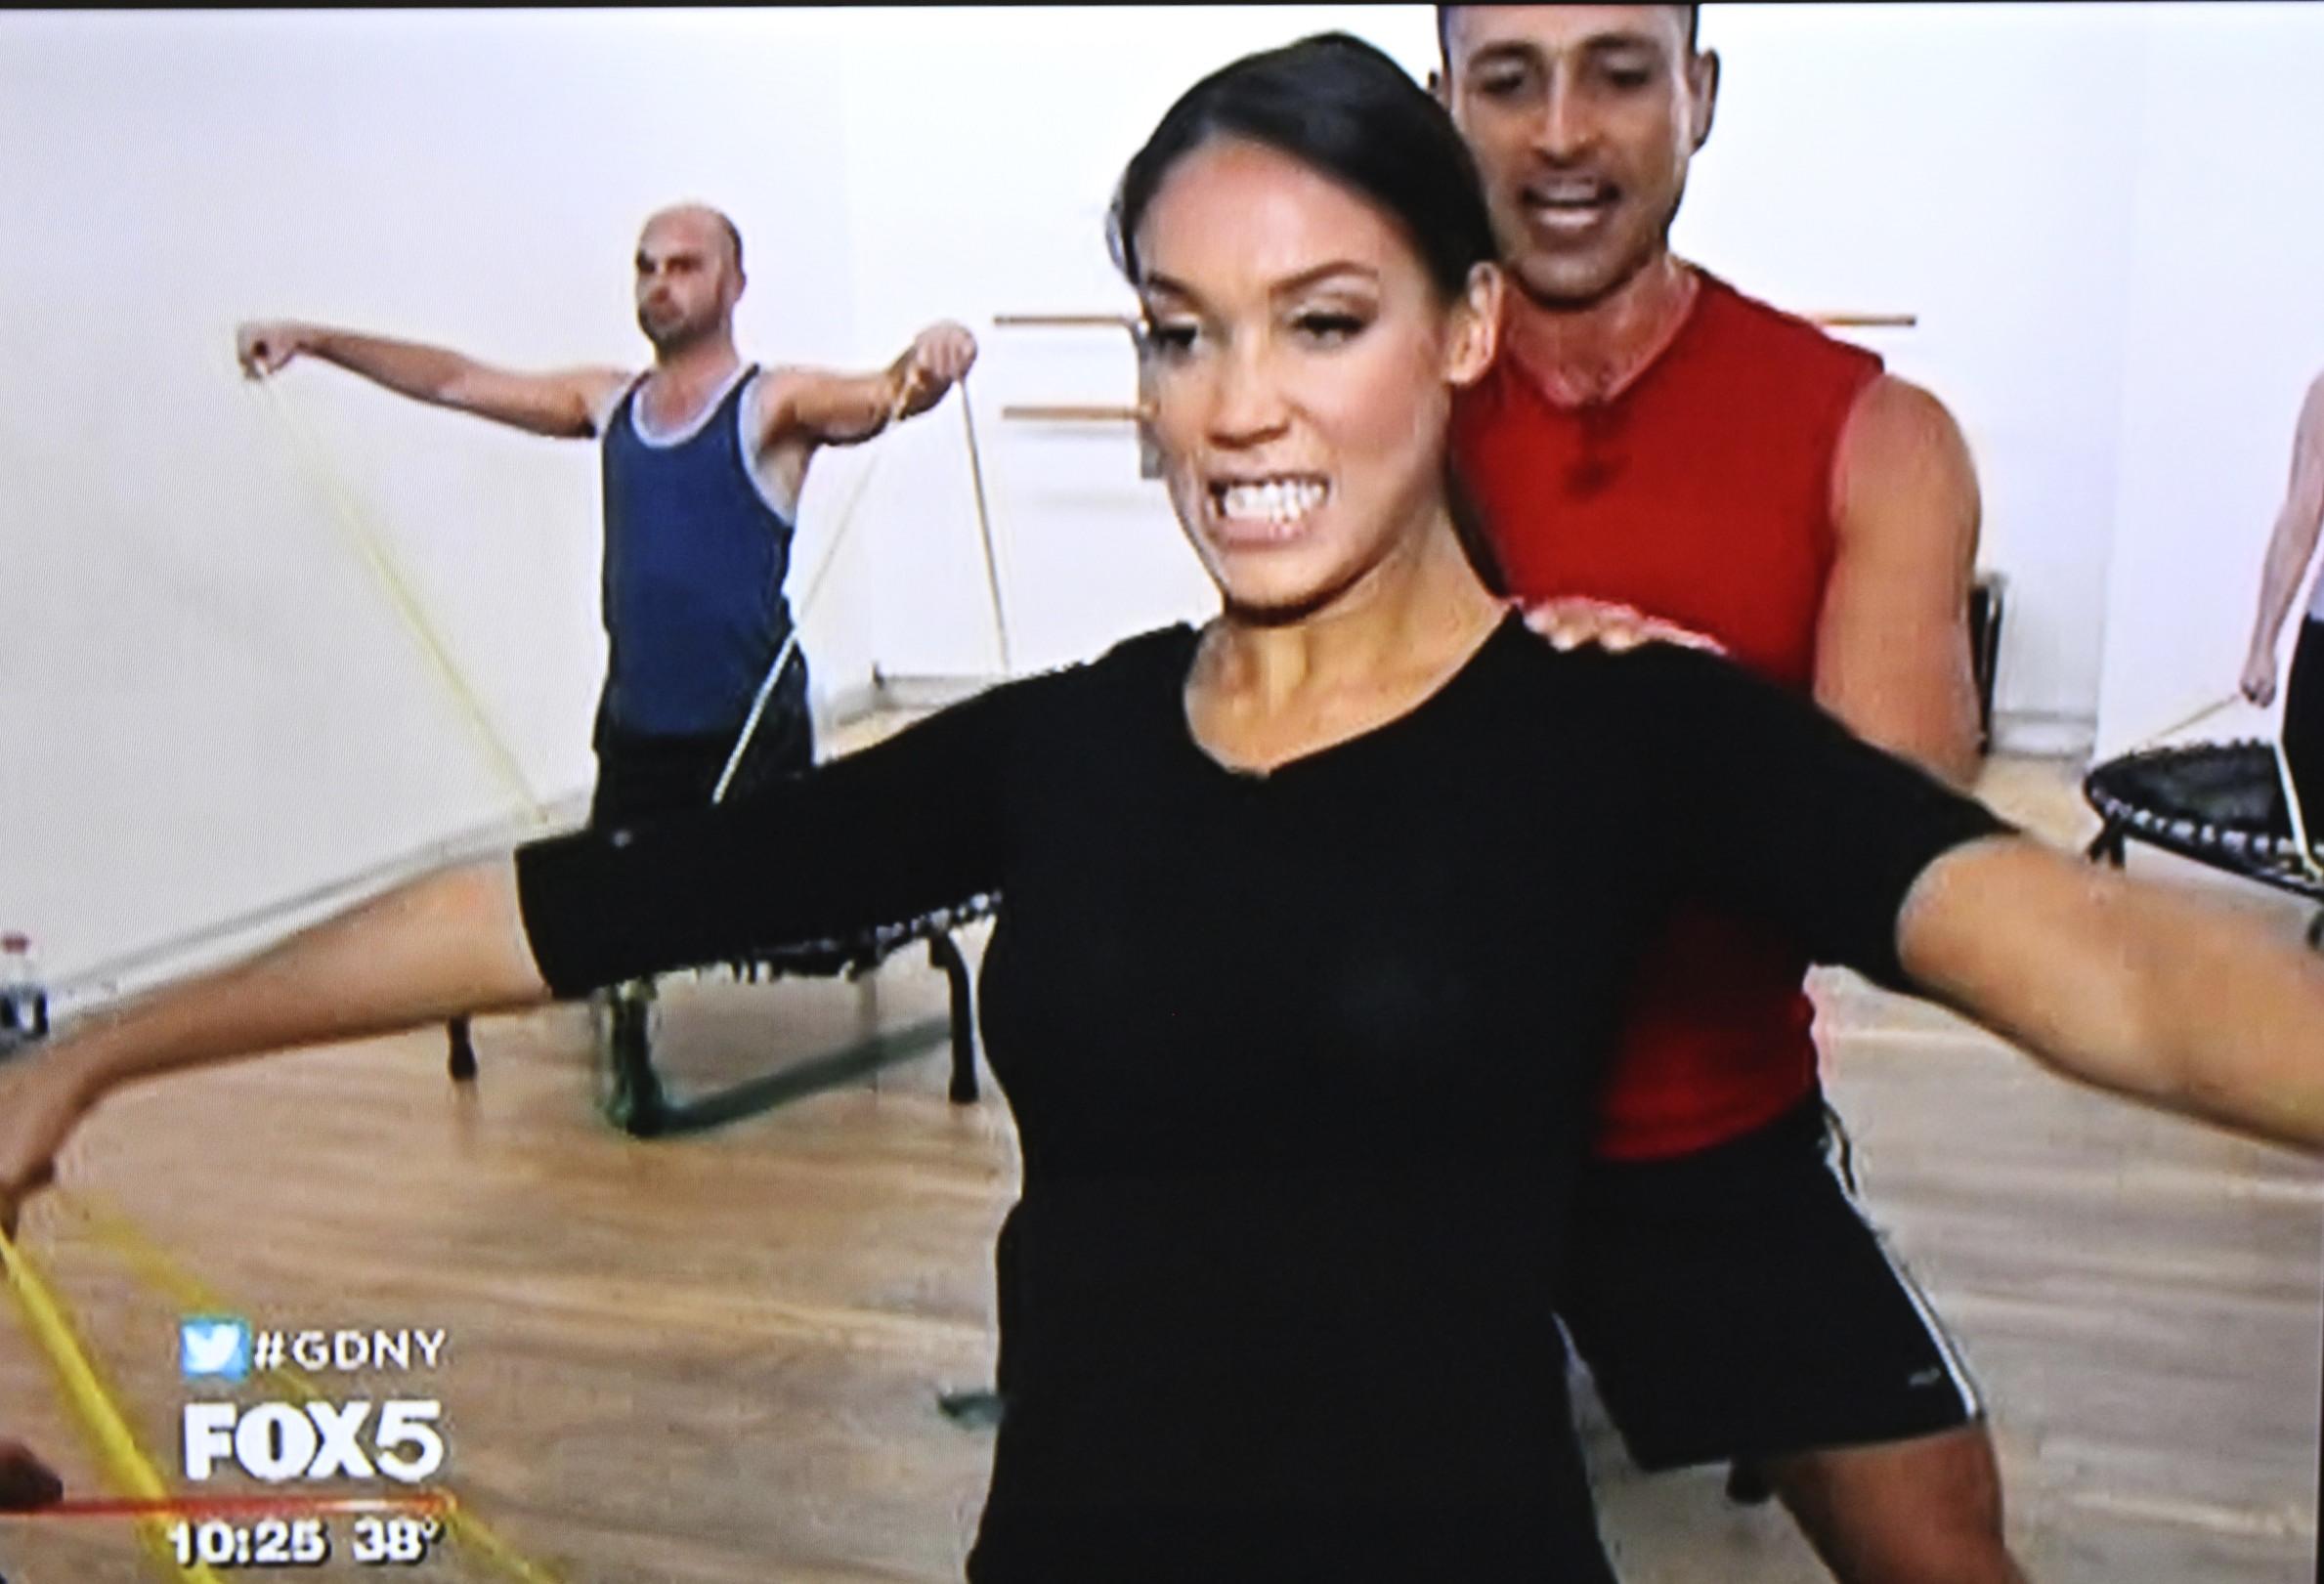 trampoLEAN on Fox 5 News